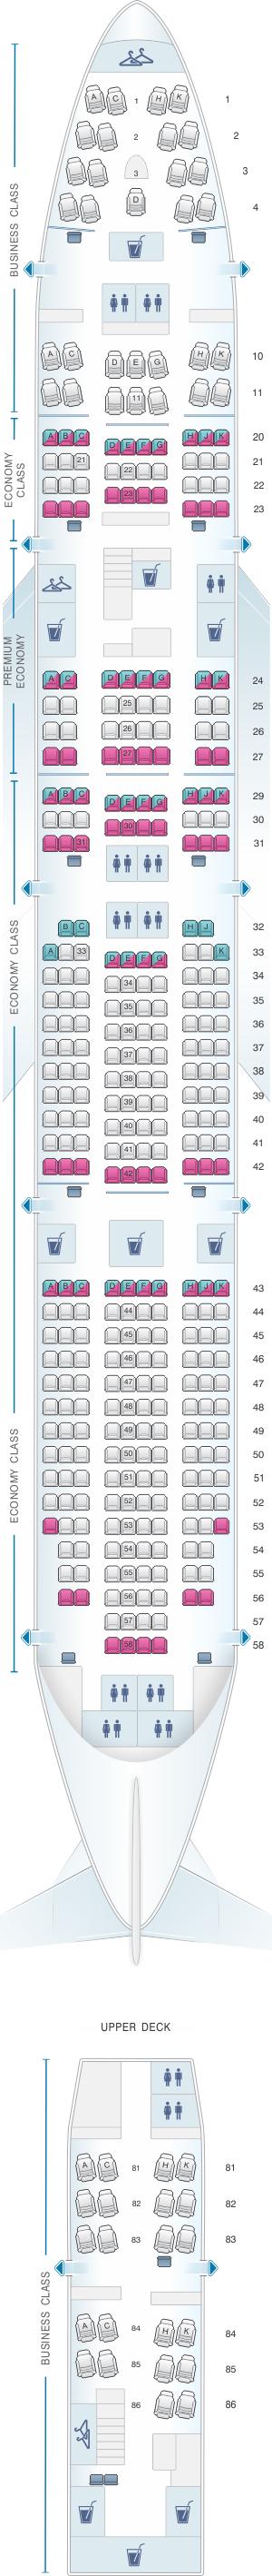 Plan de cabine lufthansa boeing b747 400 393pax for Plan de cabine boeing 747 400 corsair